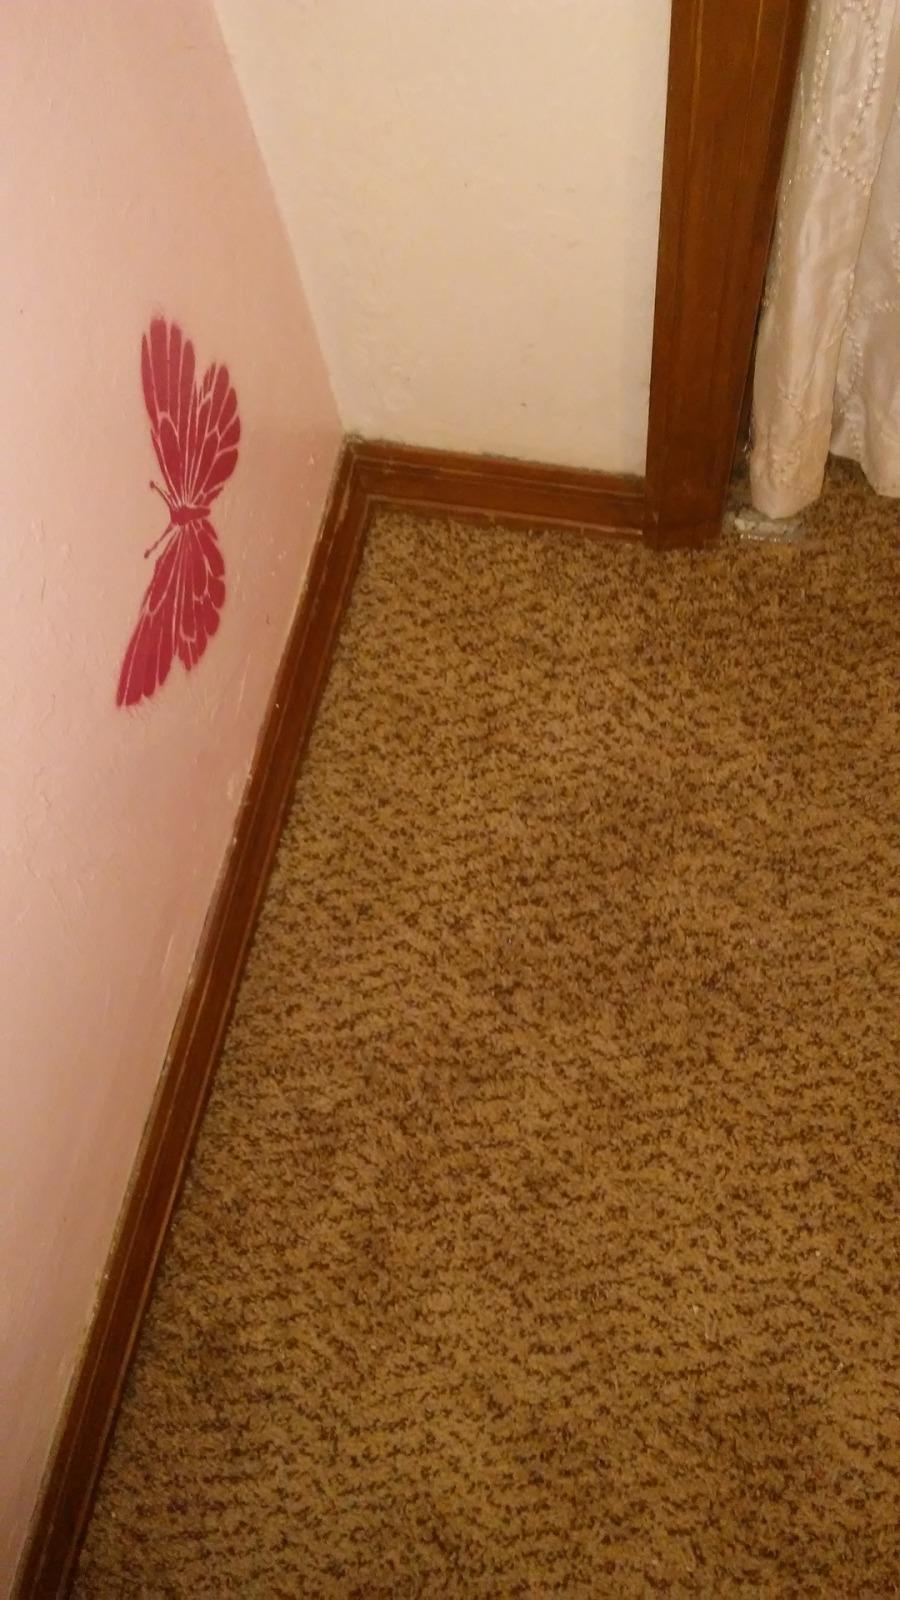 Gainesvilles local carpet repair specialists how to stretch carpet yourself solutioingenieria Choice Image